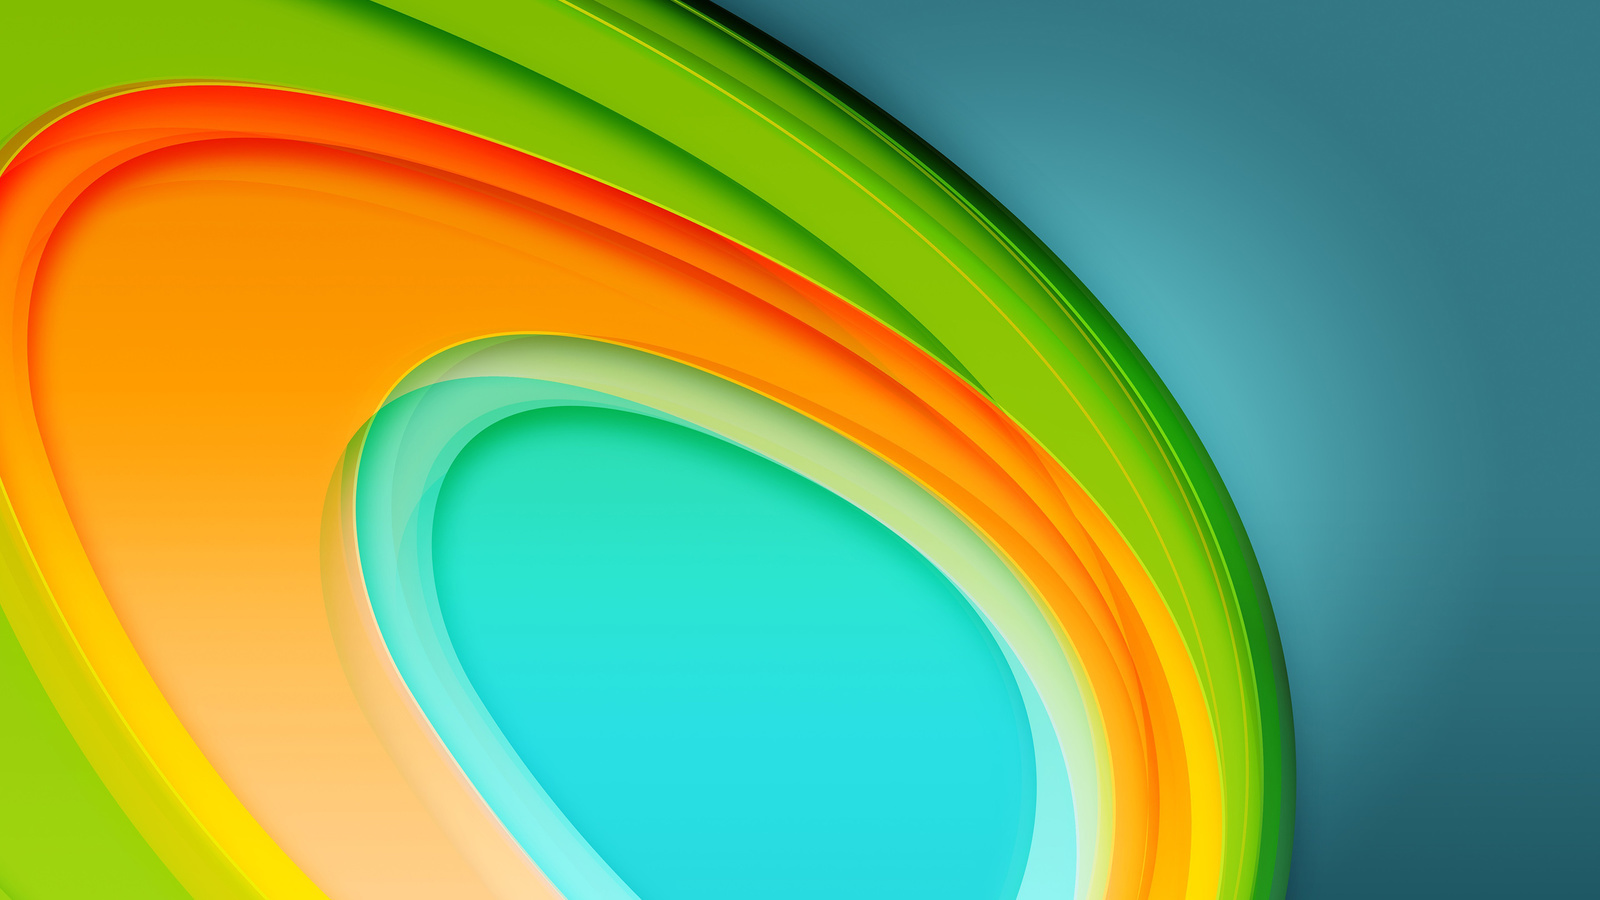 Colorful Circles 4K 5K (1600x900)